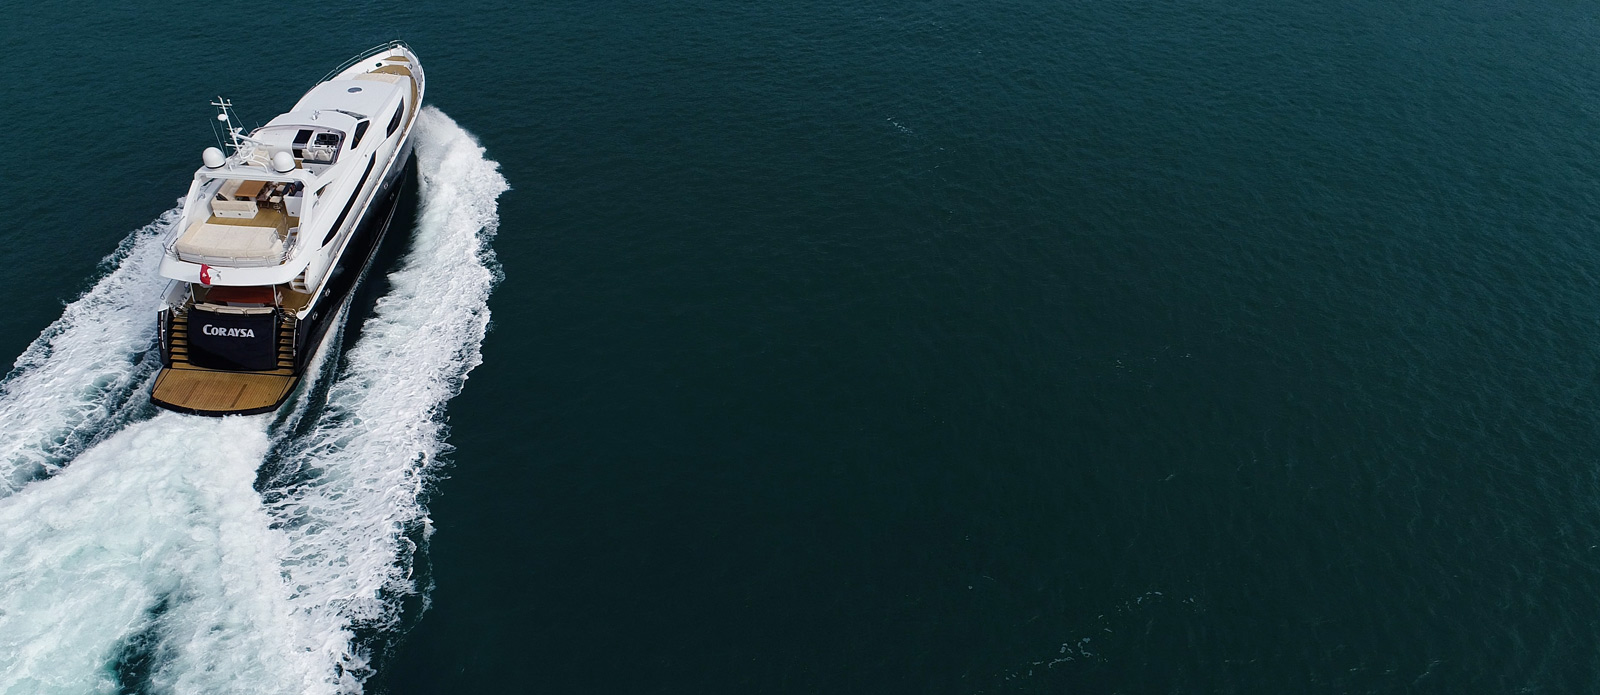 Sunseeker-30-Metre-Yacht-Coraysa-Overhead-Stern-Running-Shot